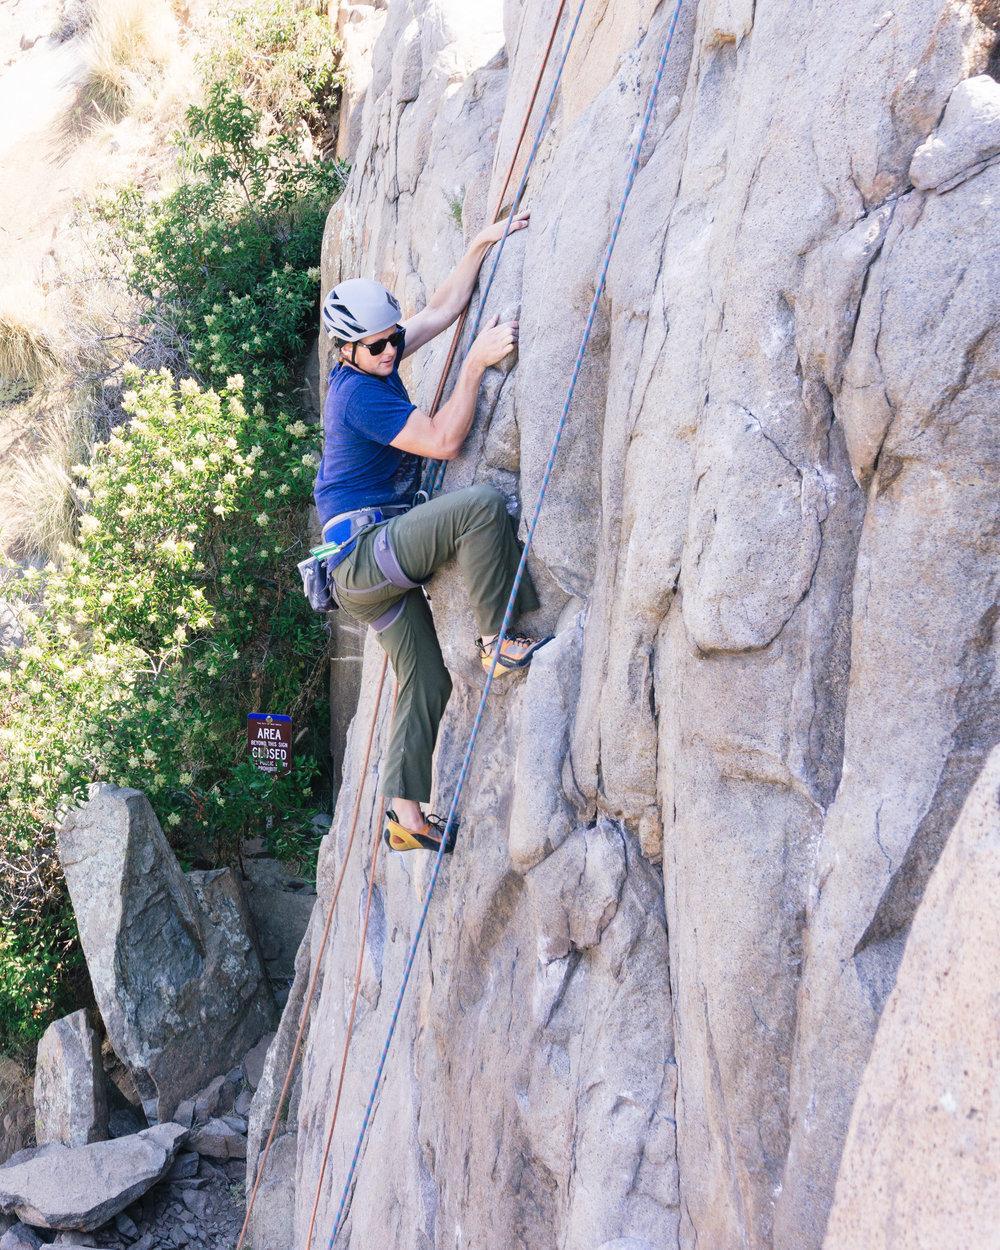 Mission Gorge Rock Climbing San Diego, California Southern California